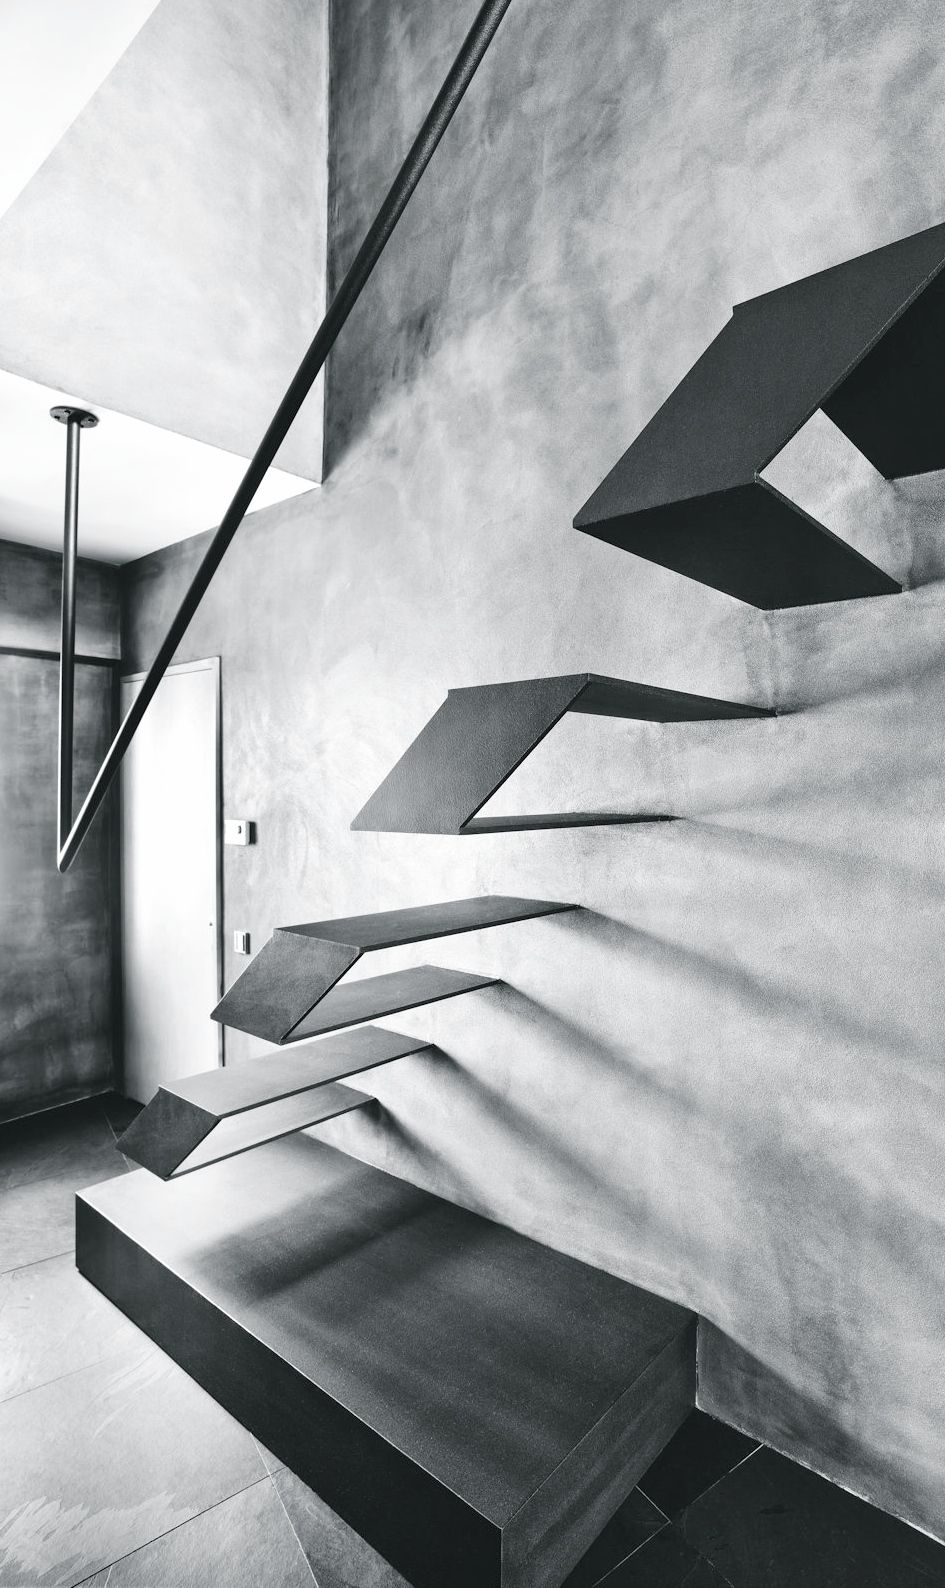 Blickfang Schwebende Treppe Foto Von Treppen